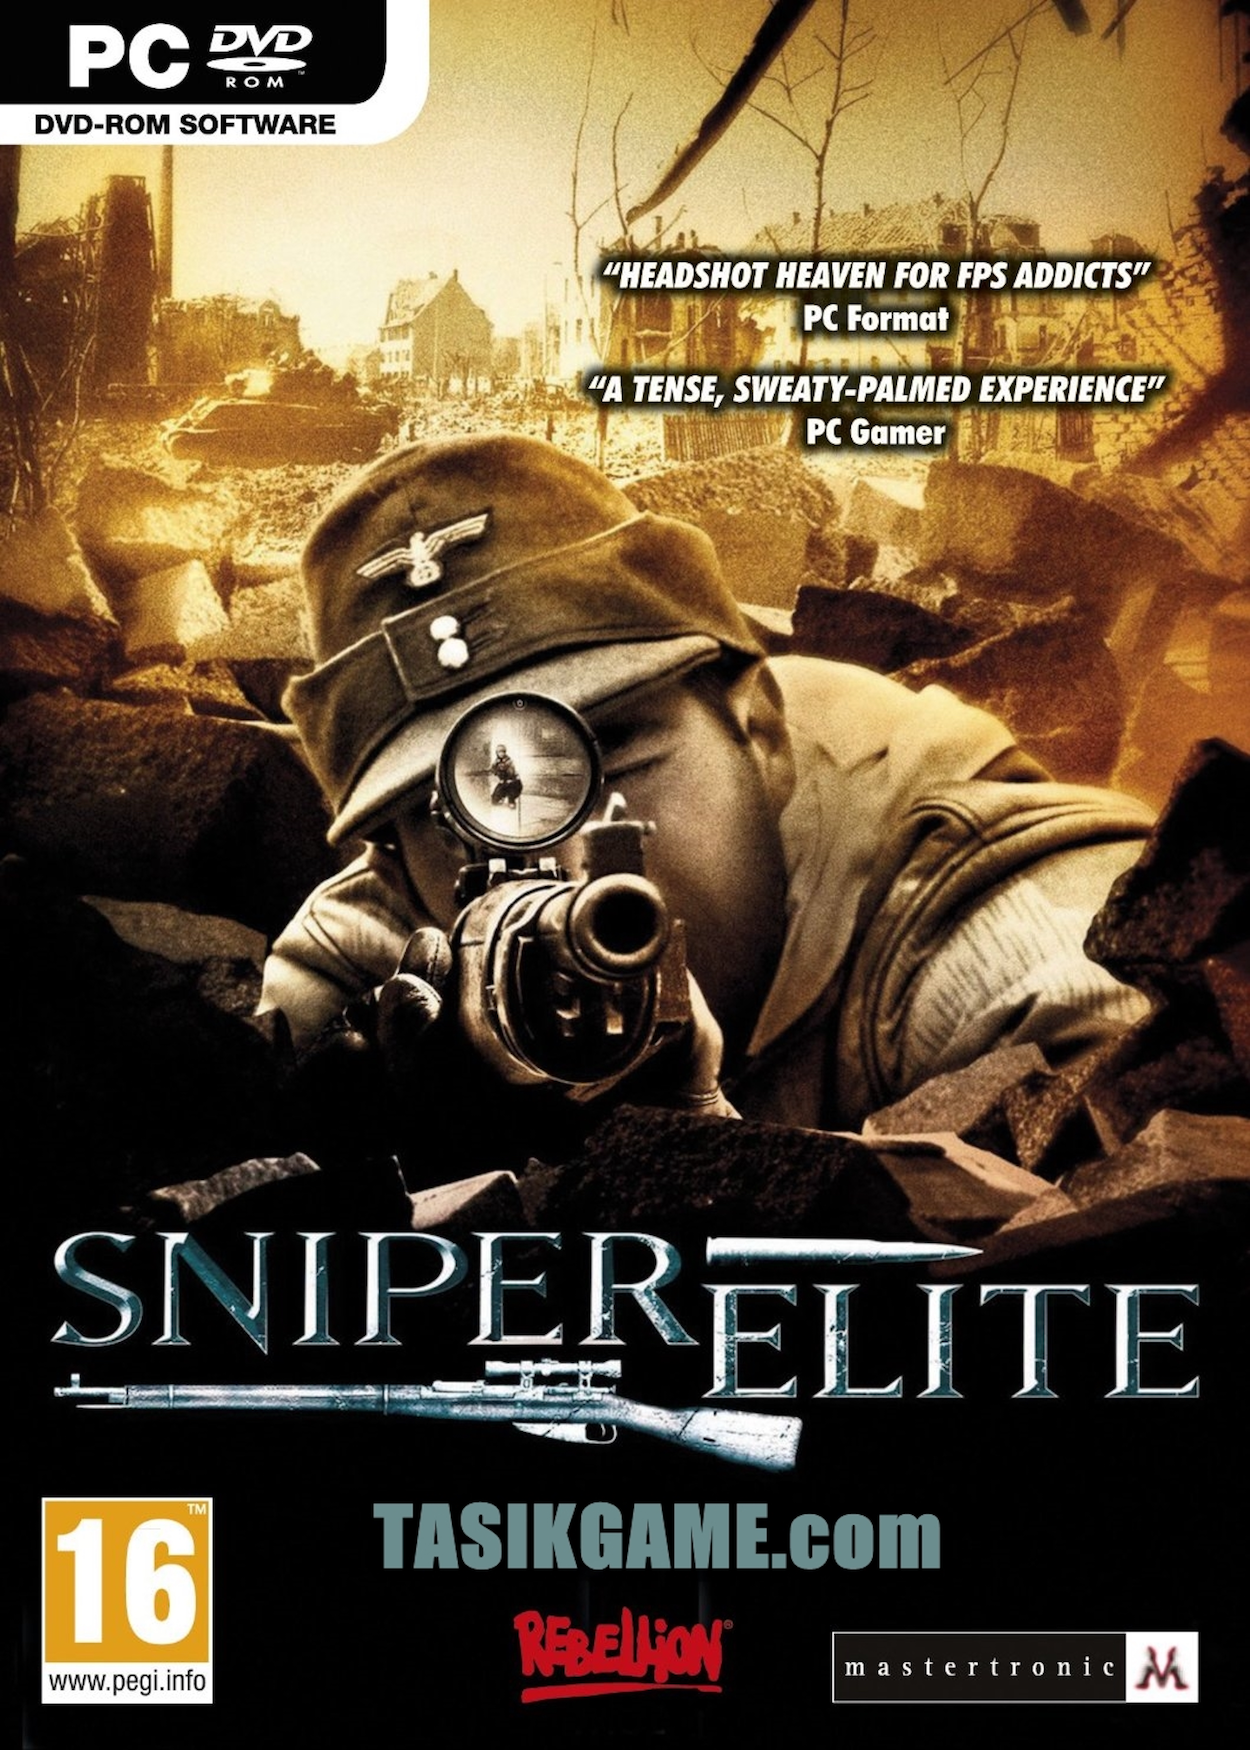 Sniper Elite Sniper Elite Wiki Fandom Powered By Wikia